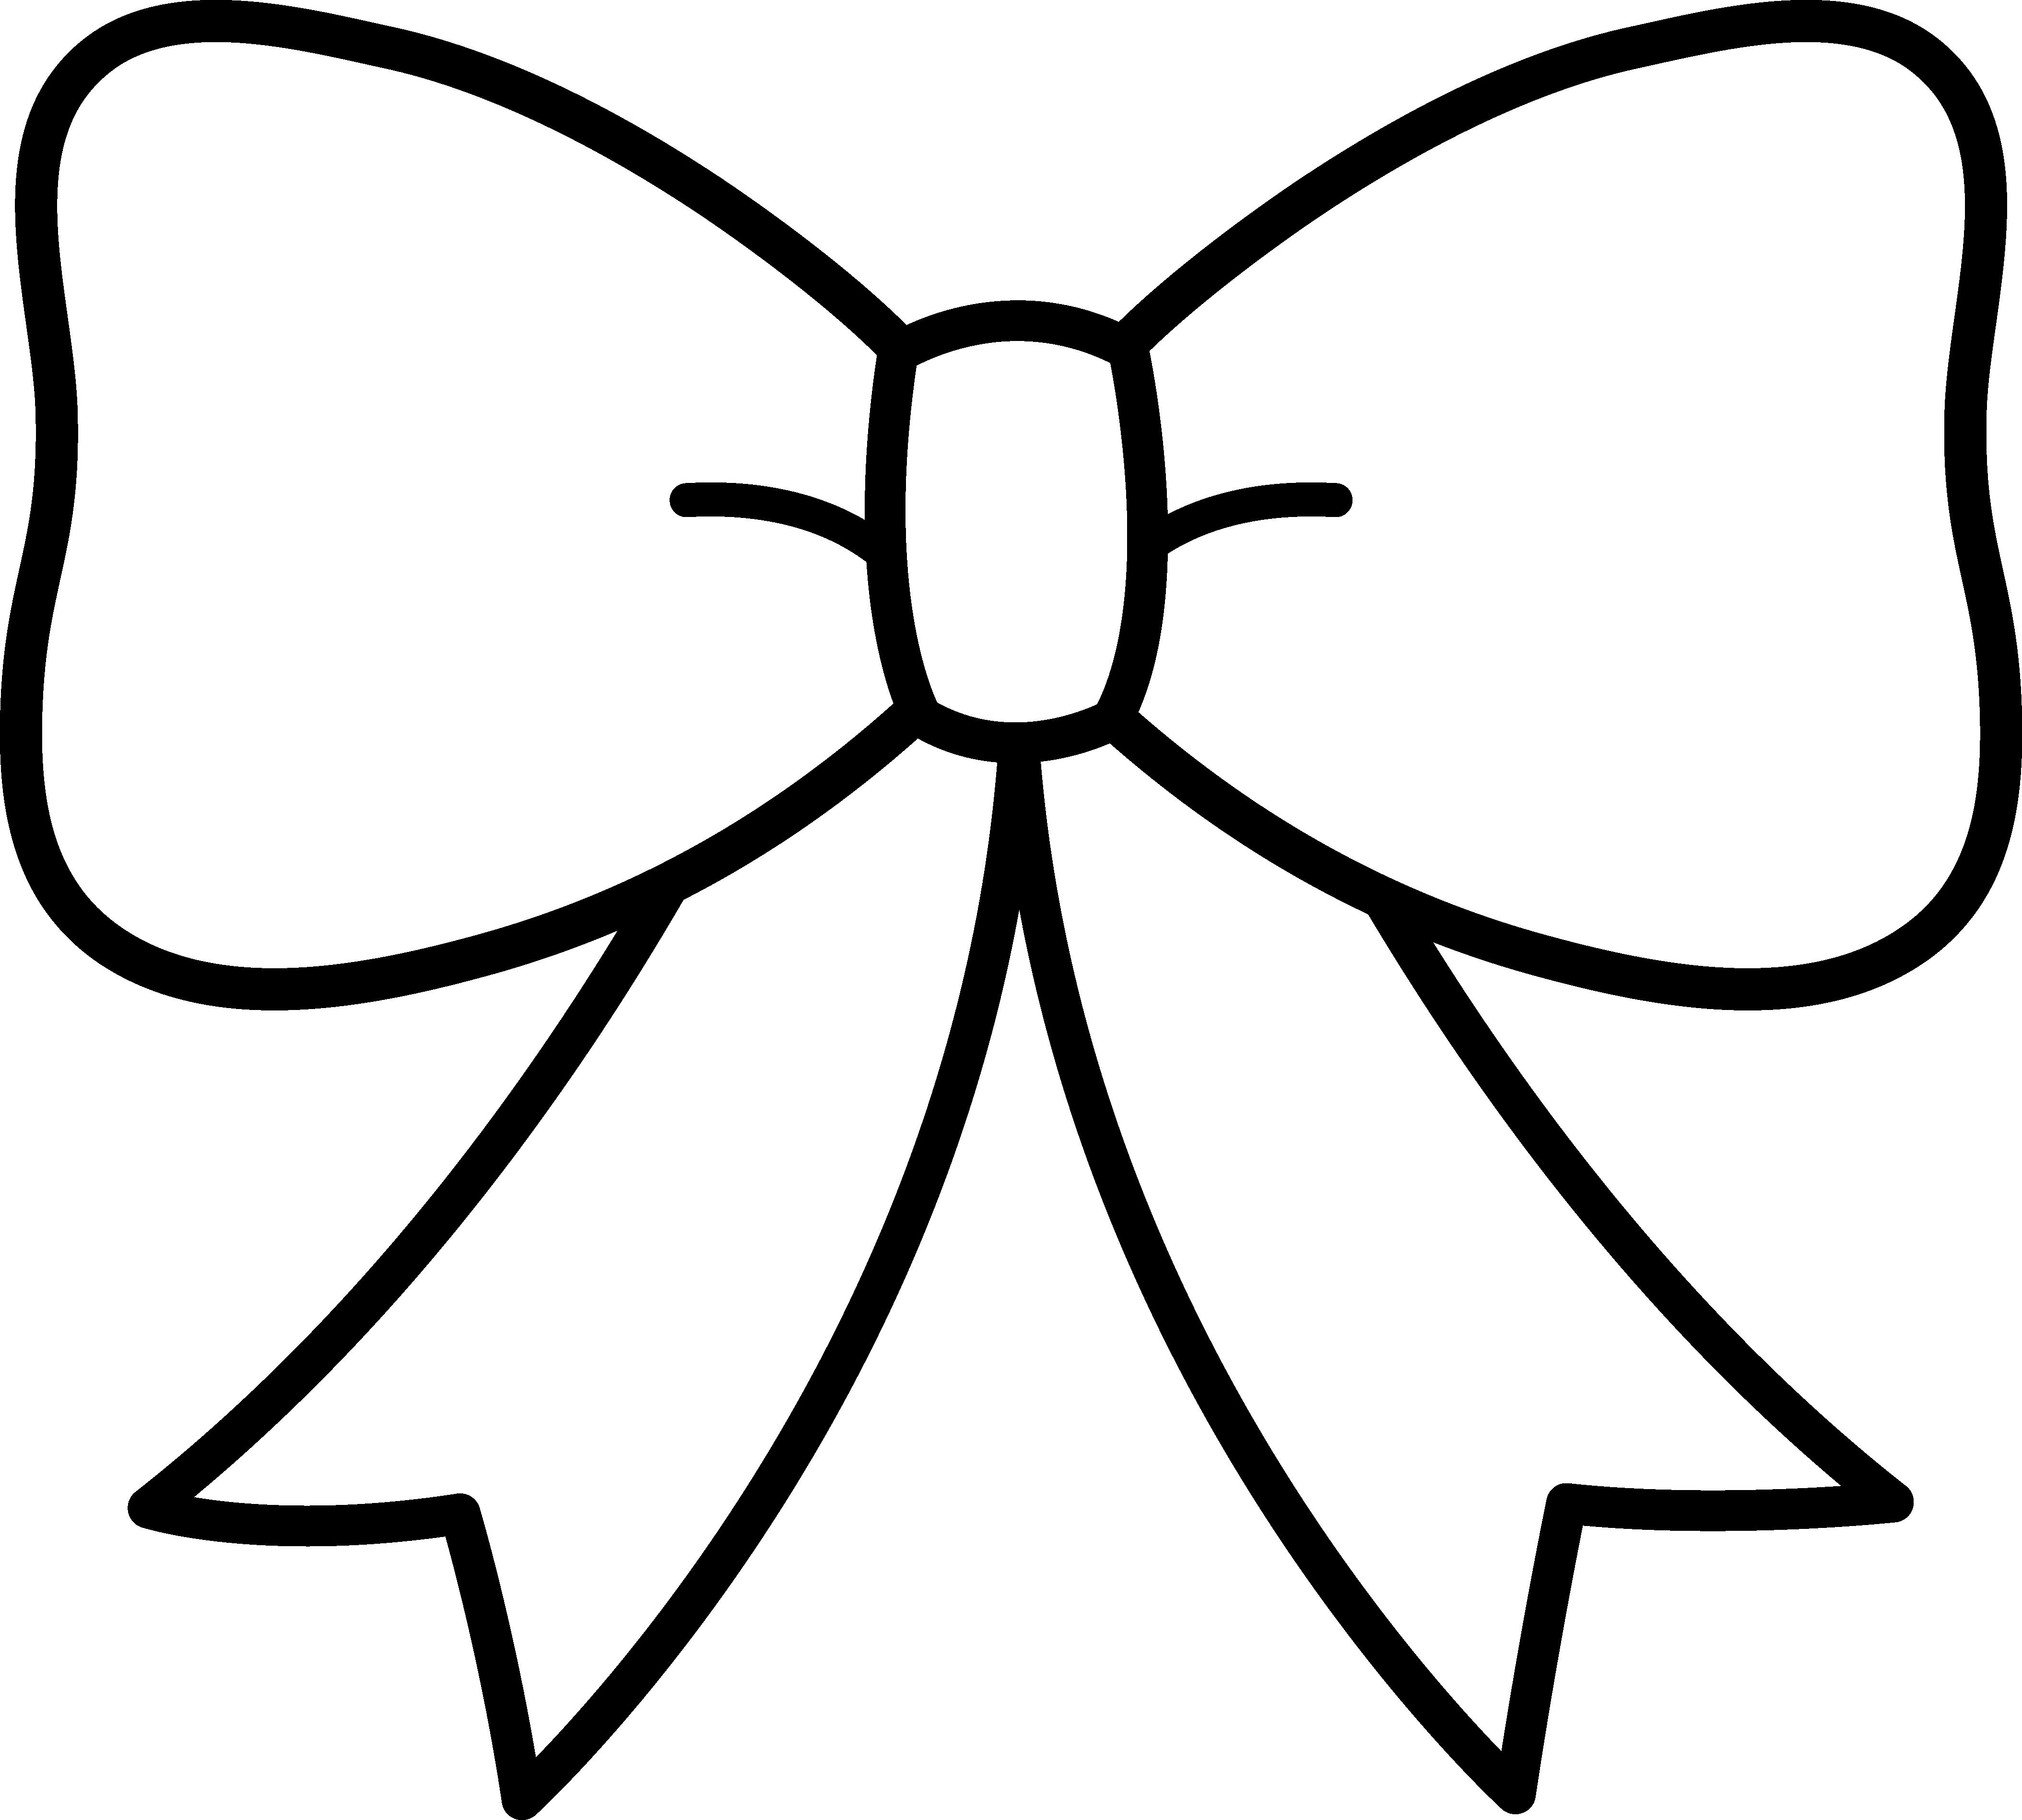 Hair Clipart Black And White-hair clipart black and white-16